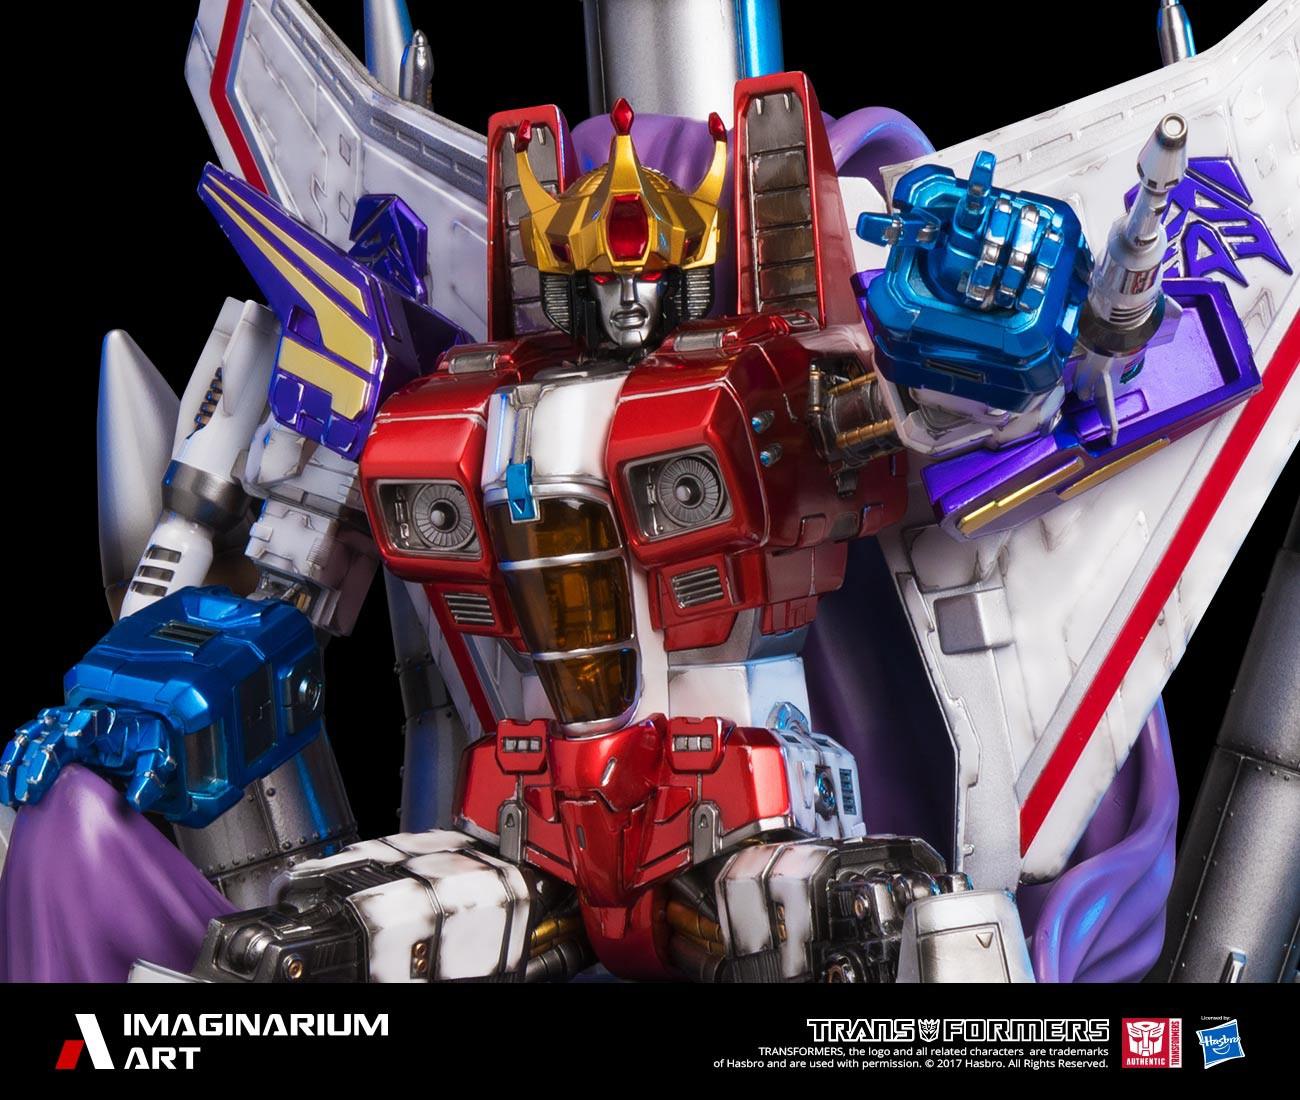 Transformers News: Colour Images of Imaginarium Art Transformers Statue Coronation Starscream